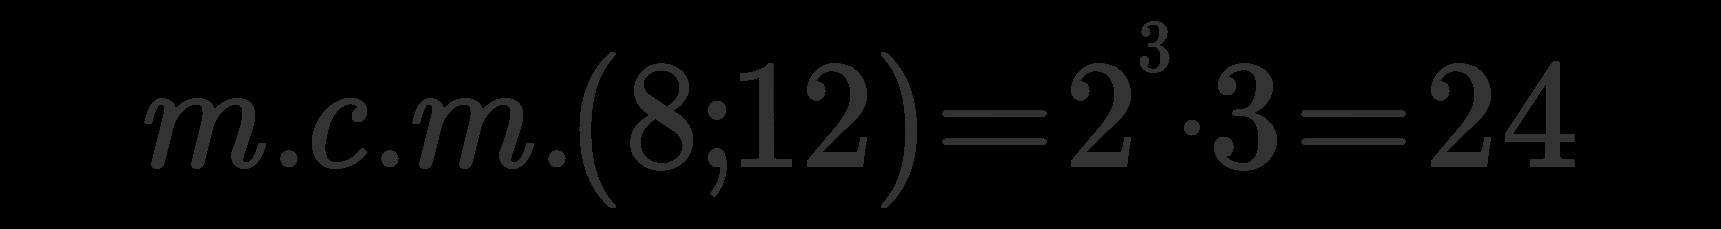 mcm risultato esempio 1